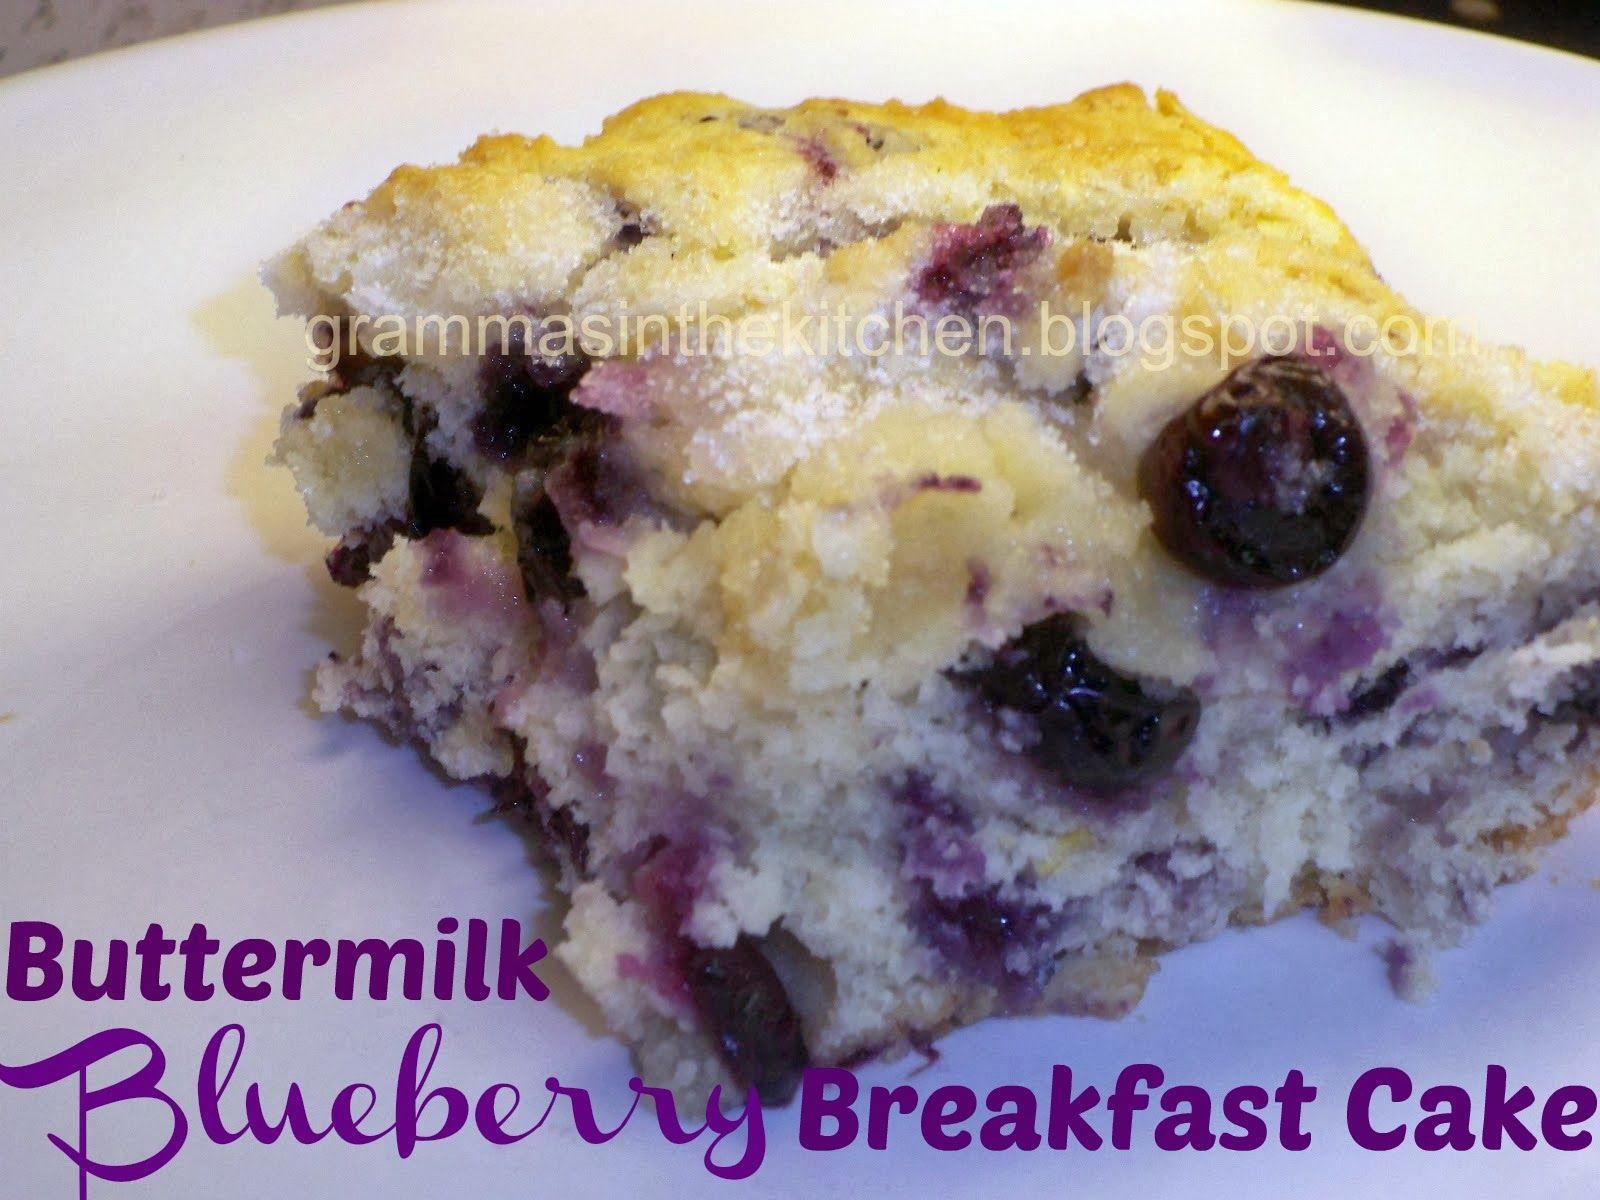 Buttermilk-Blueberry Breakfast Cake #buttermilkblueberrybreakfastcake